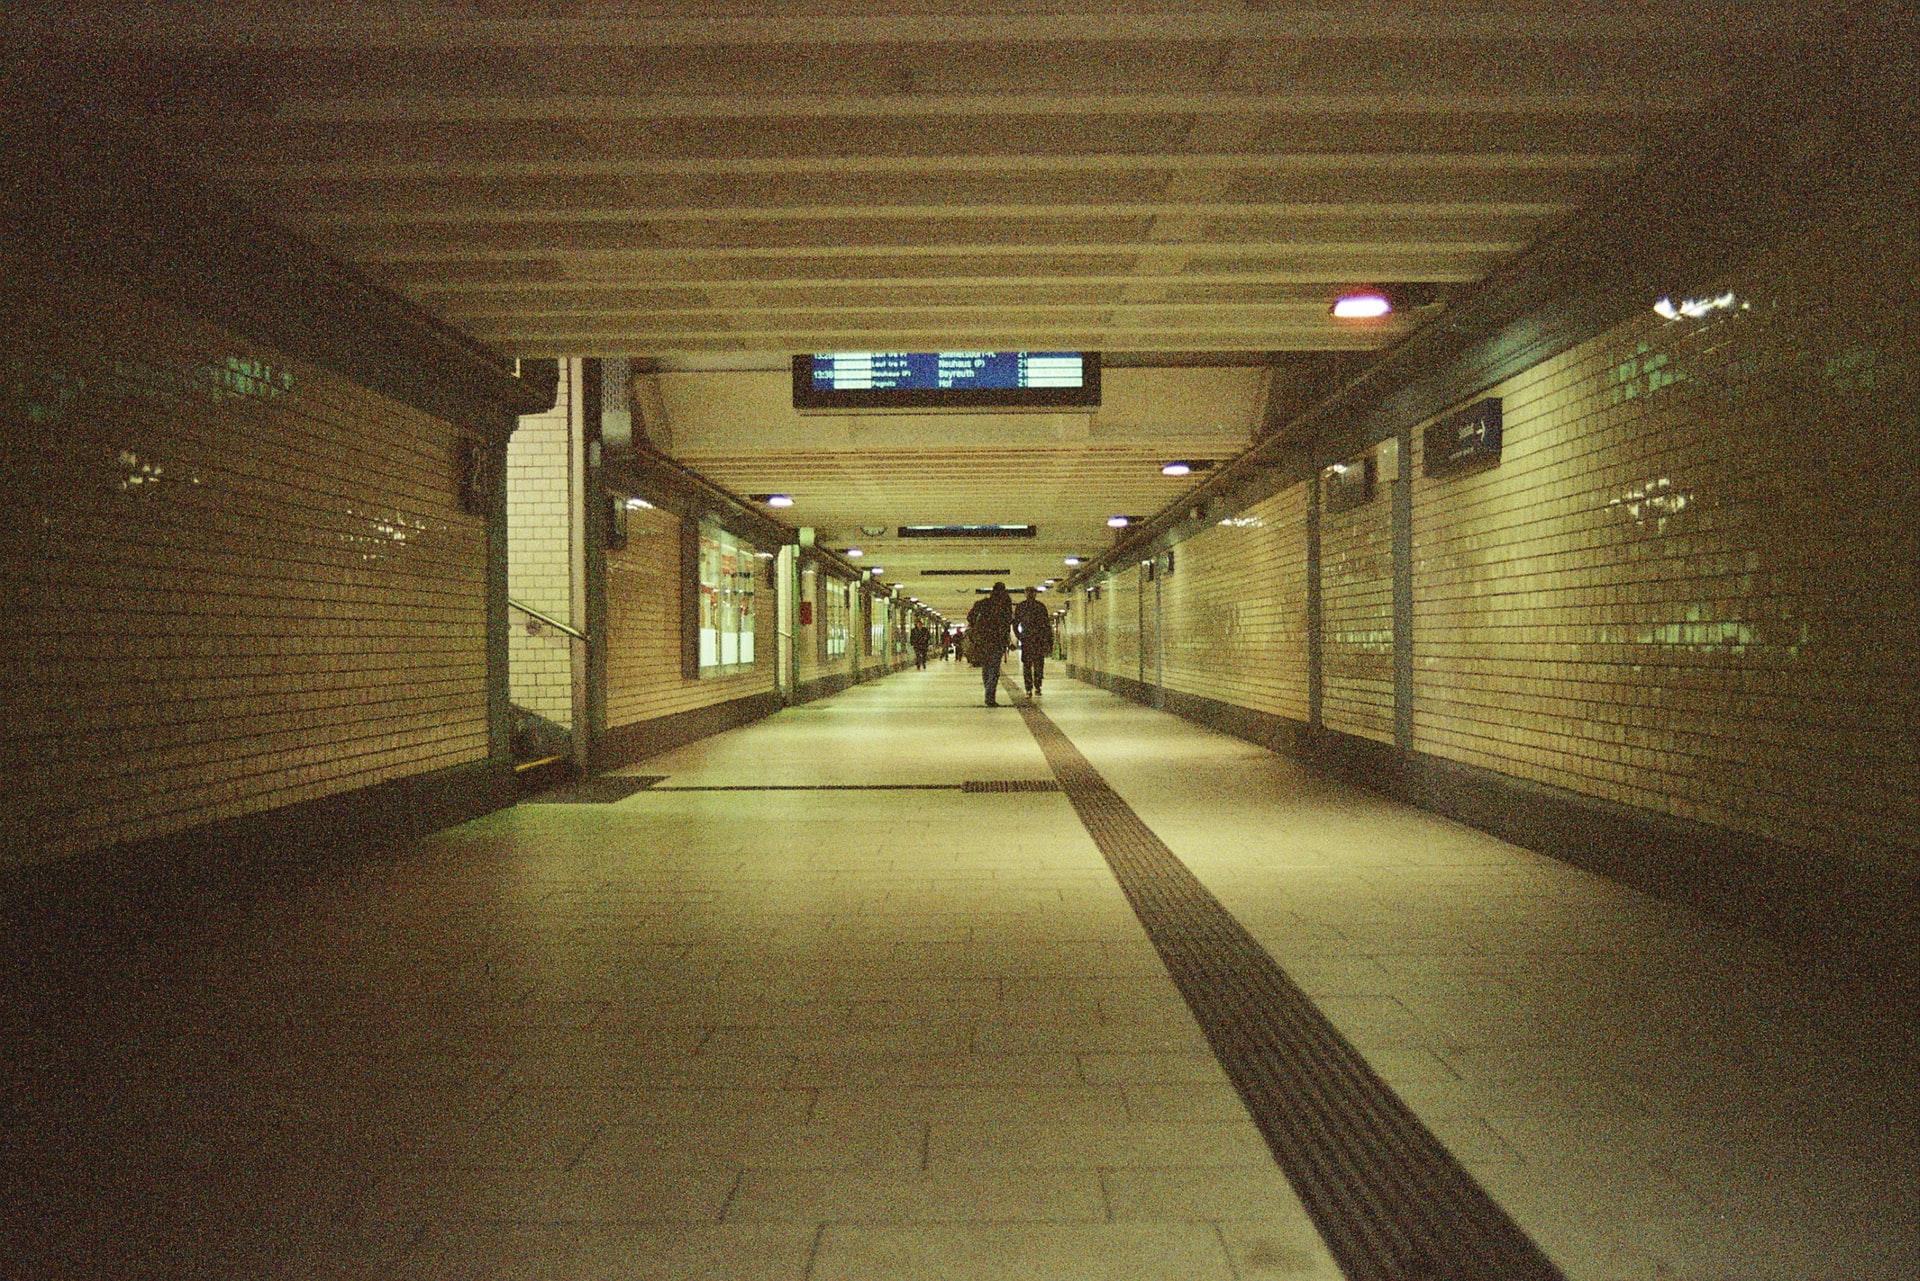 Quai de gare vide la nuit